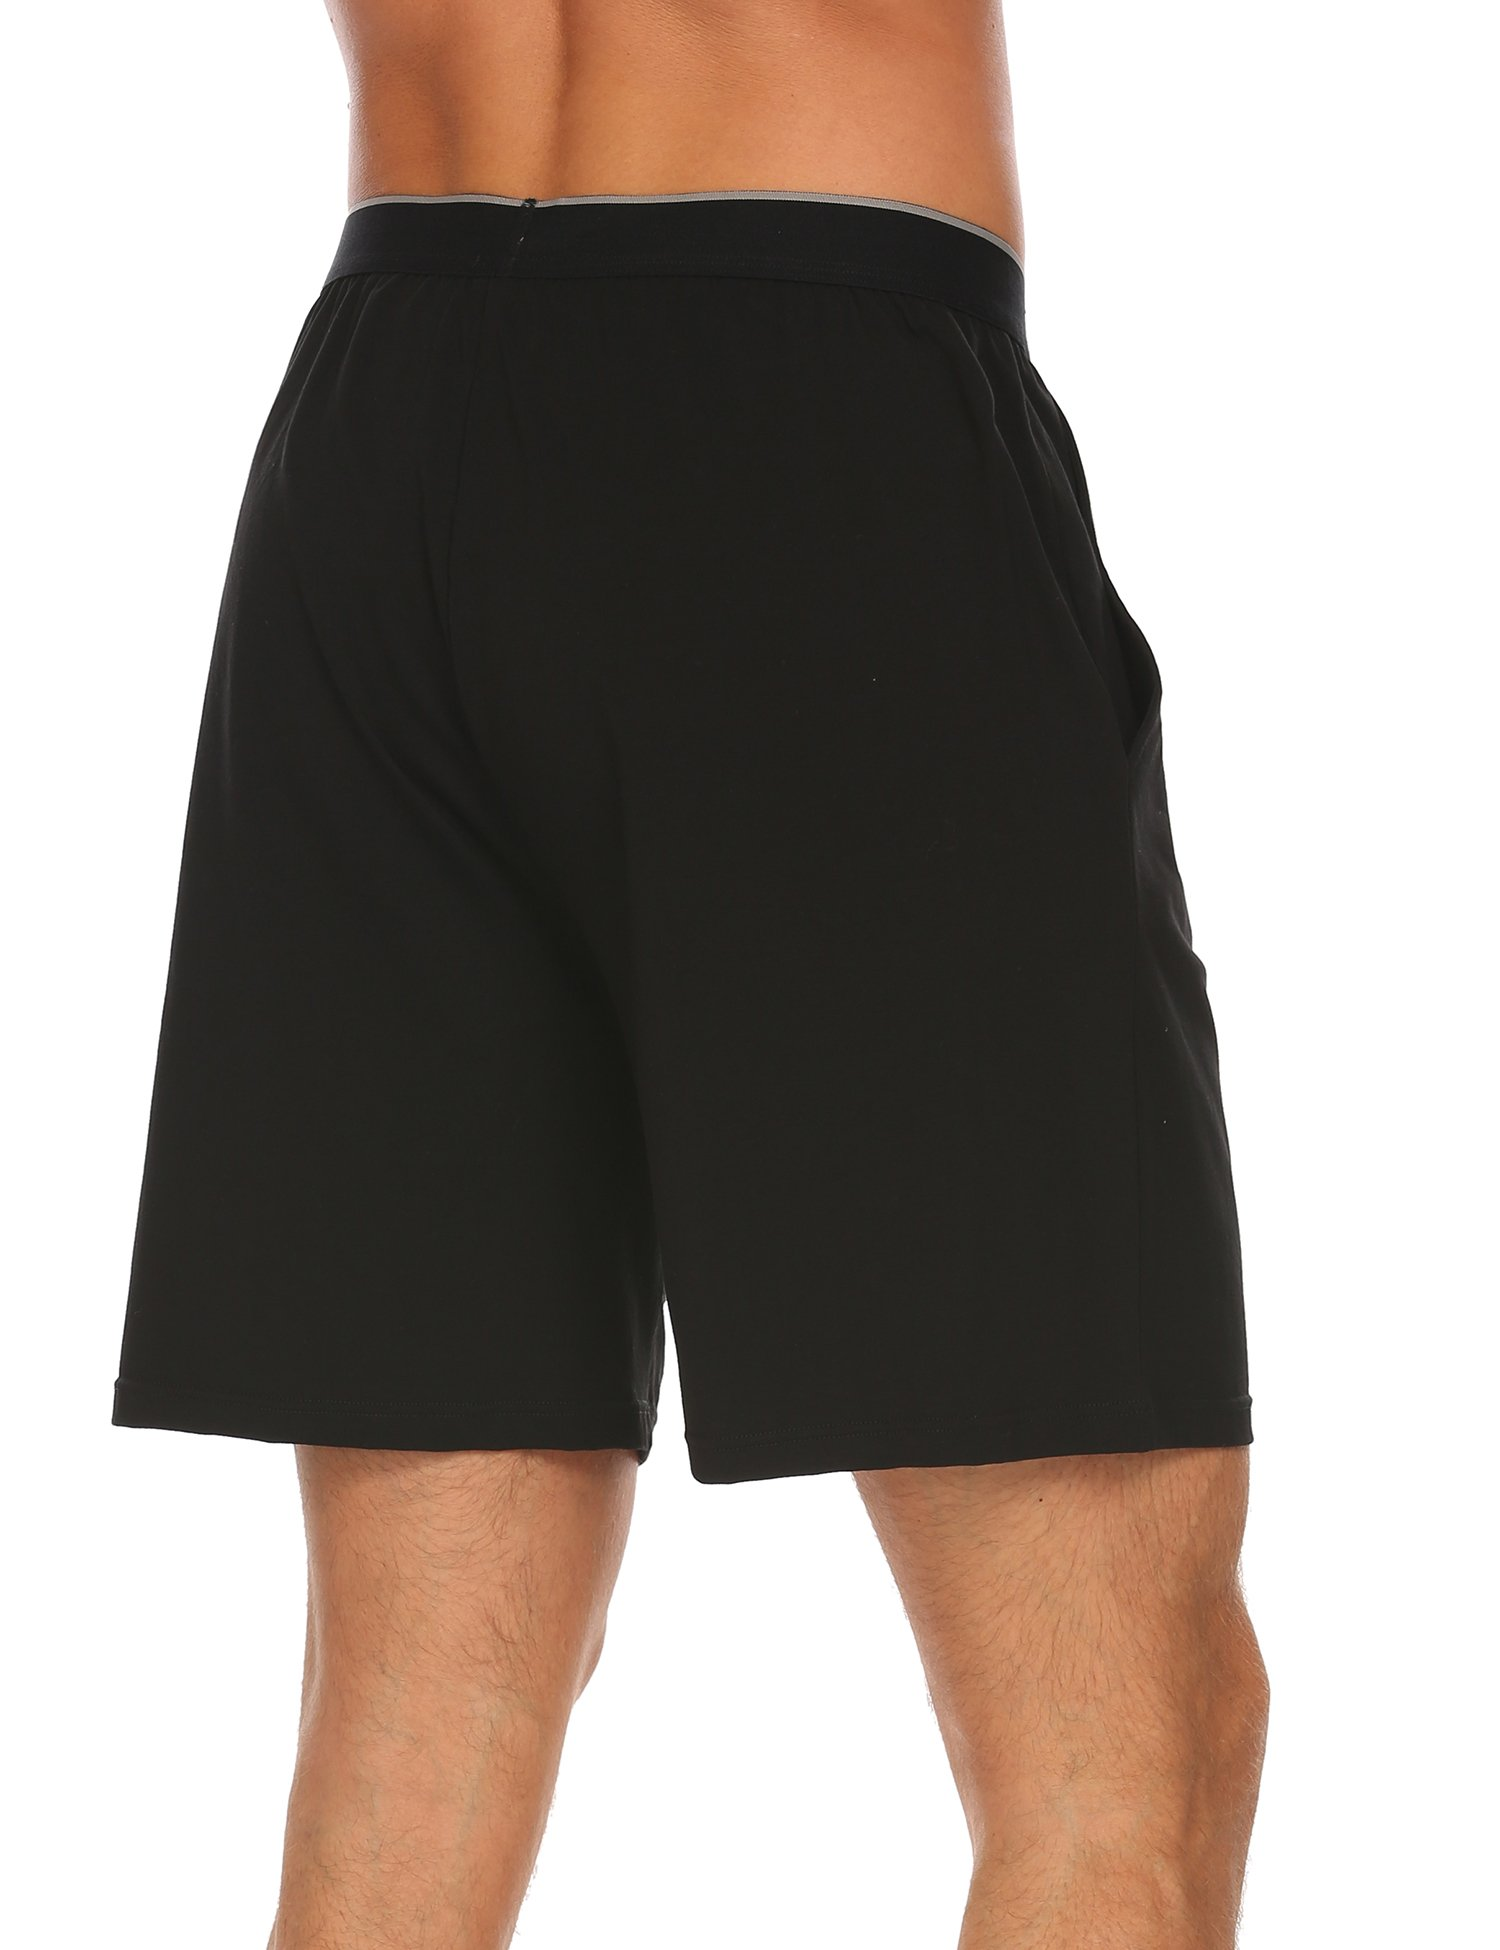 Ekouaer Men's Soft Comfort Loose Gym Pajama Bottoms Sleep Lounge Casual Shorts